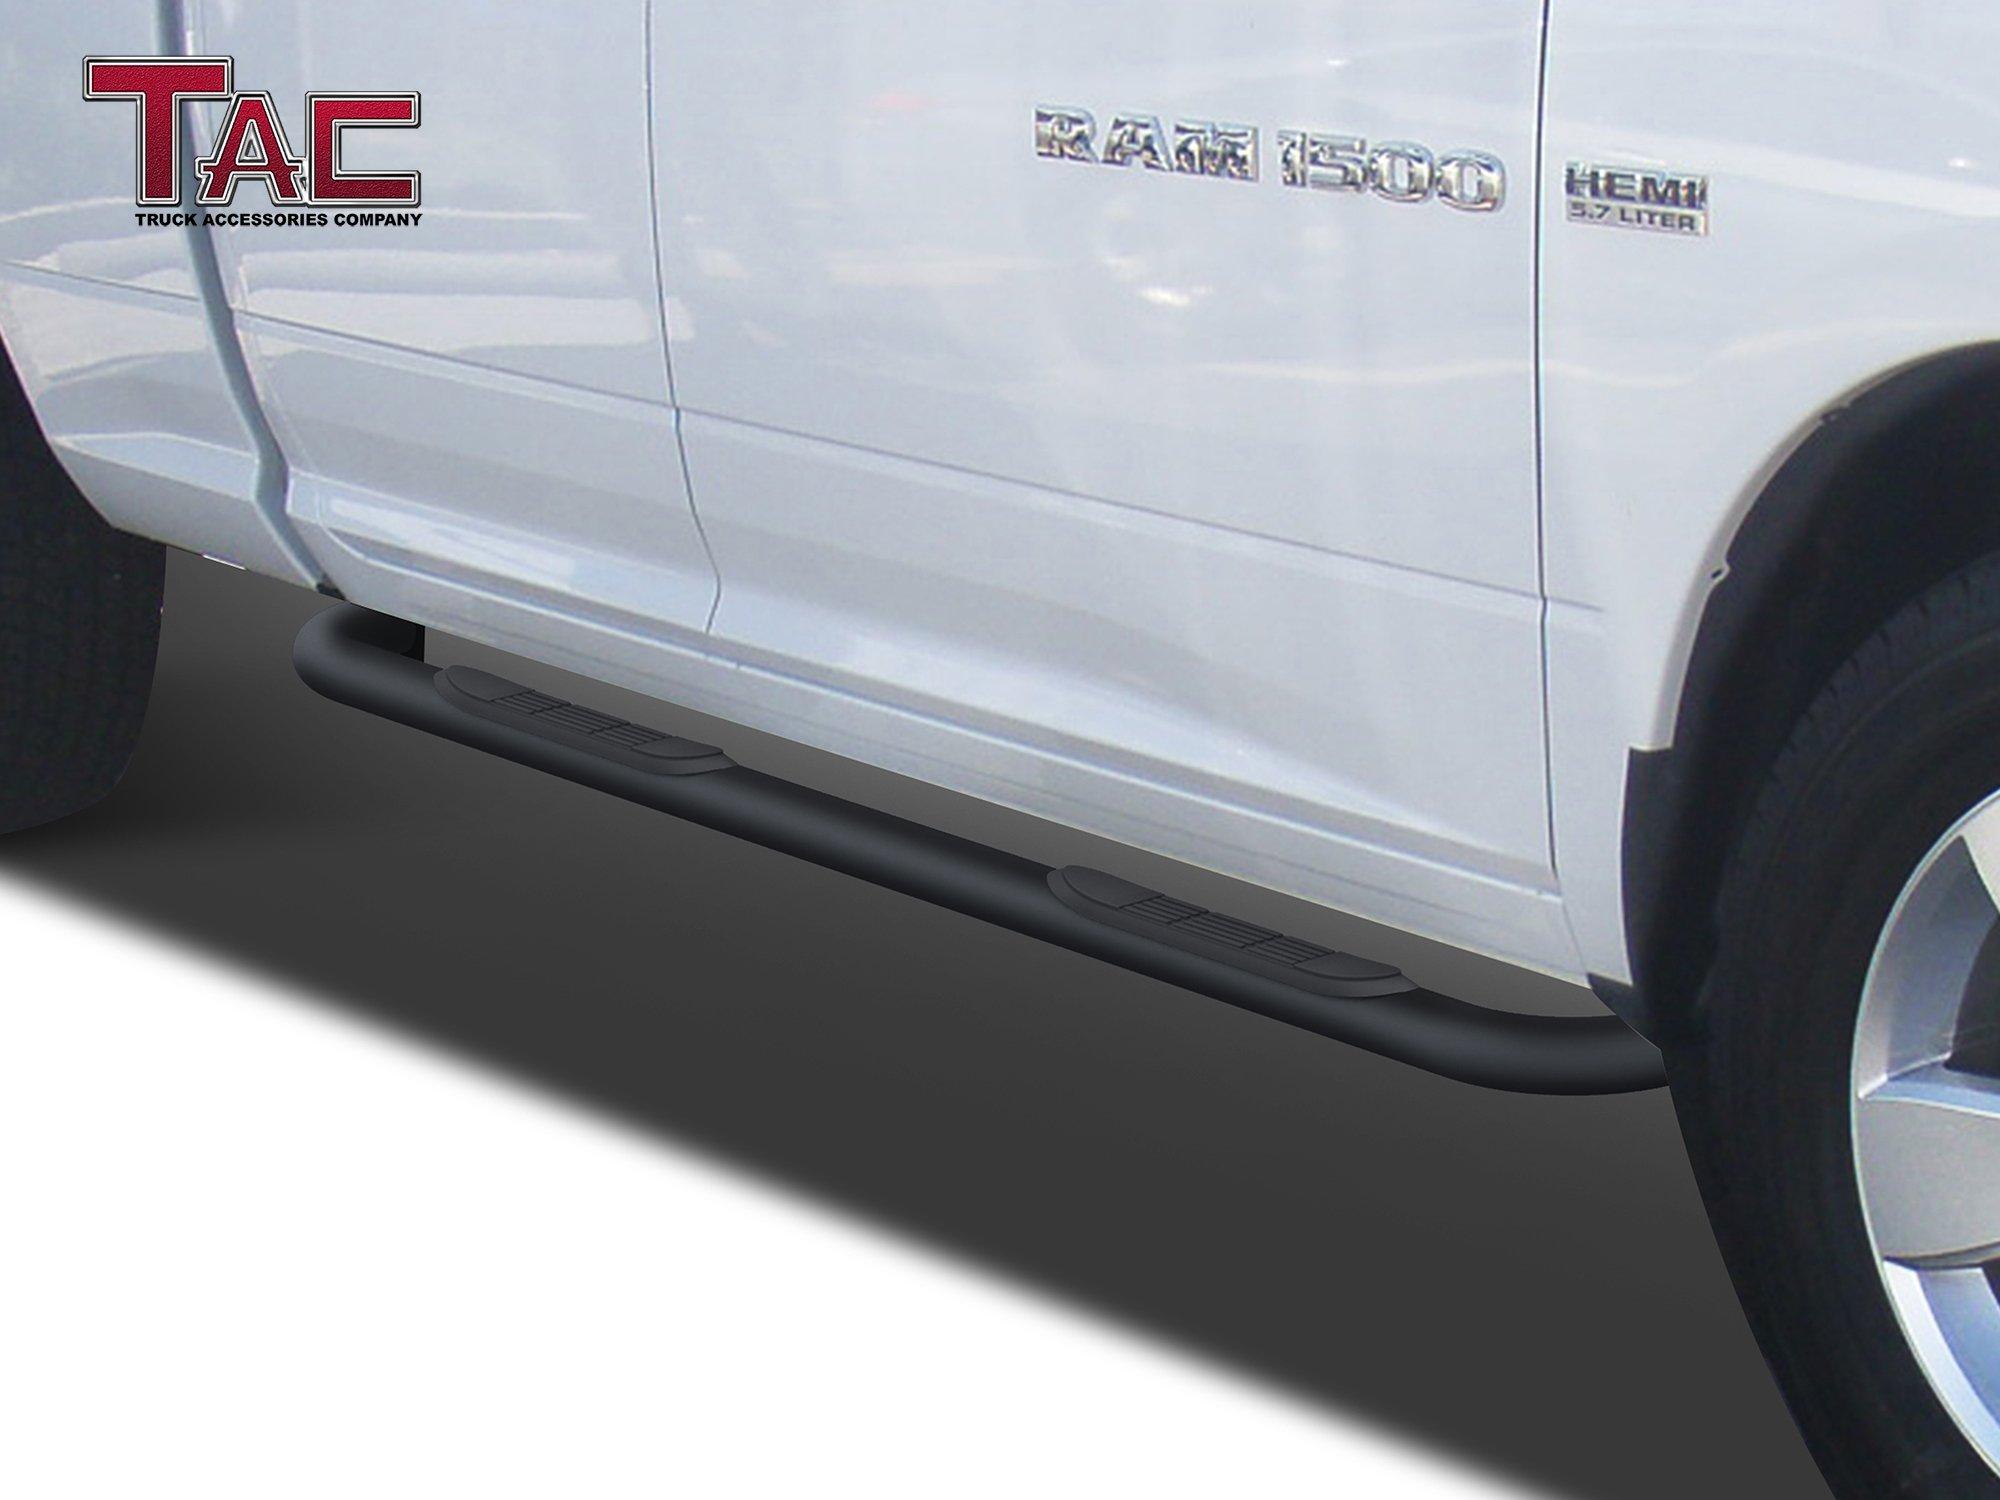 TAC Side Steps Fit 2009-2018 Dodge Ram 1500 Quad Cab Truck Pickup 3'' Black Side Bars Nerf Bars Step Rails Running Boards Off Road Exterior Accessories (2 Pieces Running Boards) by TAC TRUCK ACCESSORIES COMPANY (Image #2)